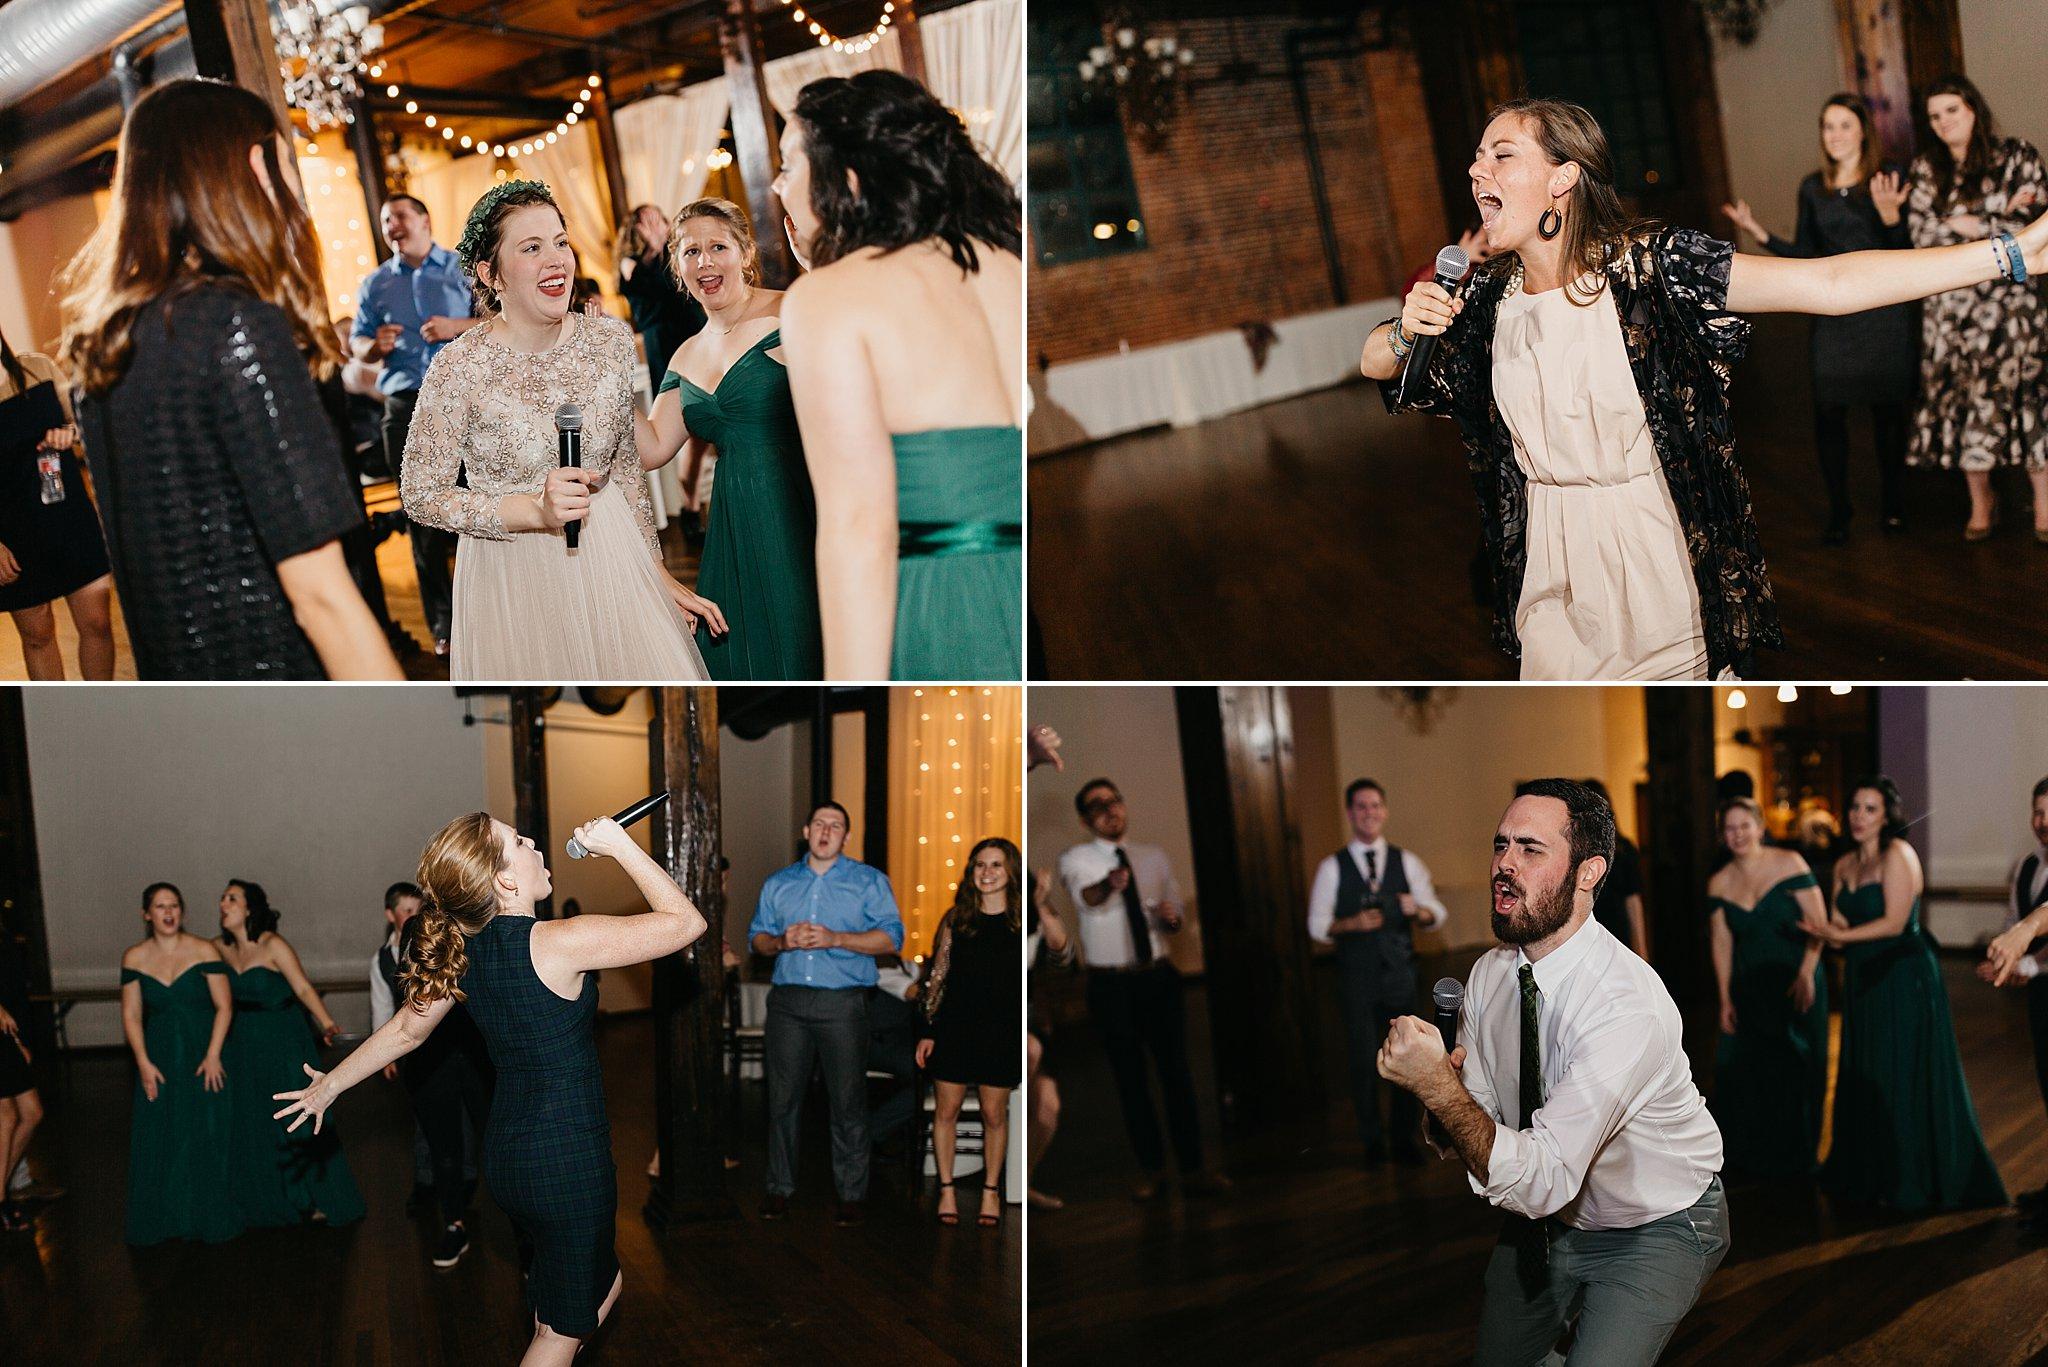 Wilderlove Co_Waco Texas_The Phoenix_Romantic Wedding Photography_0098.jpg